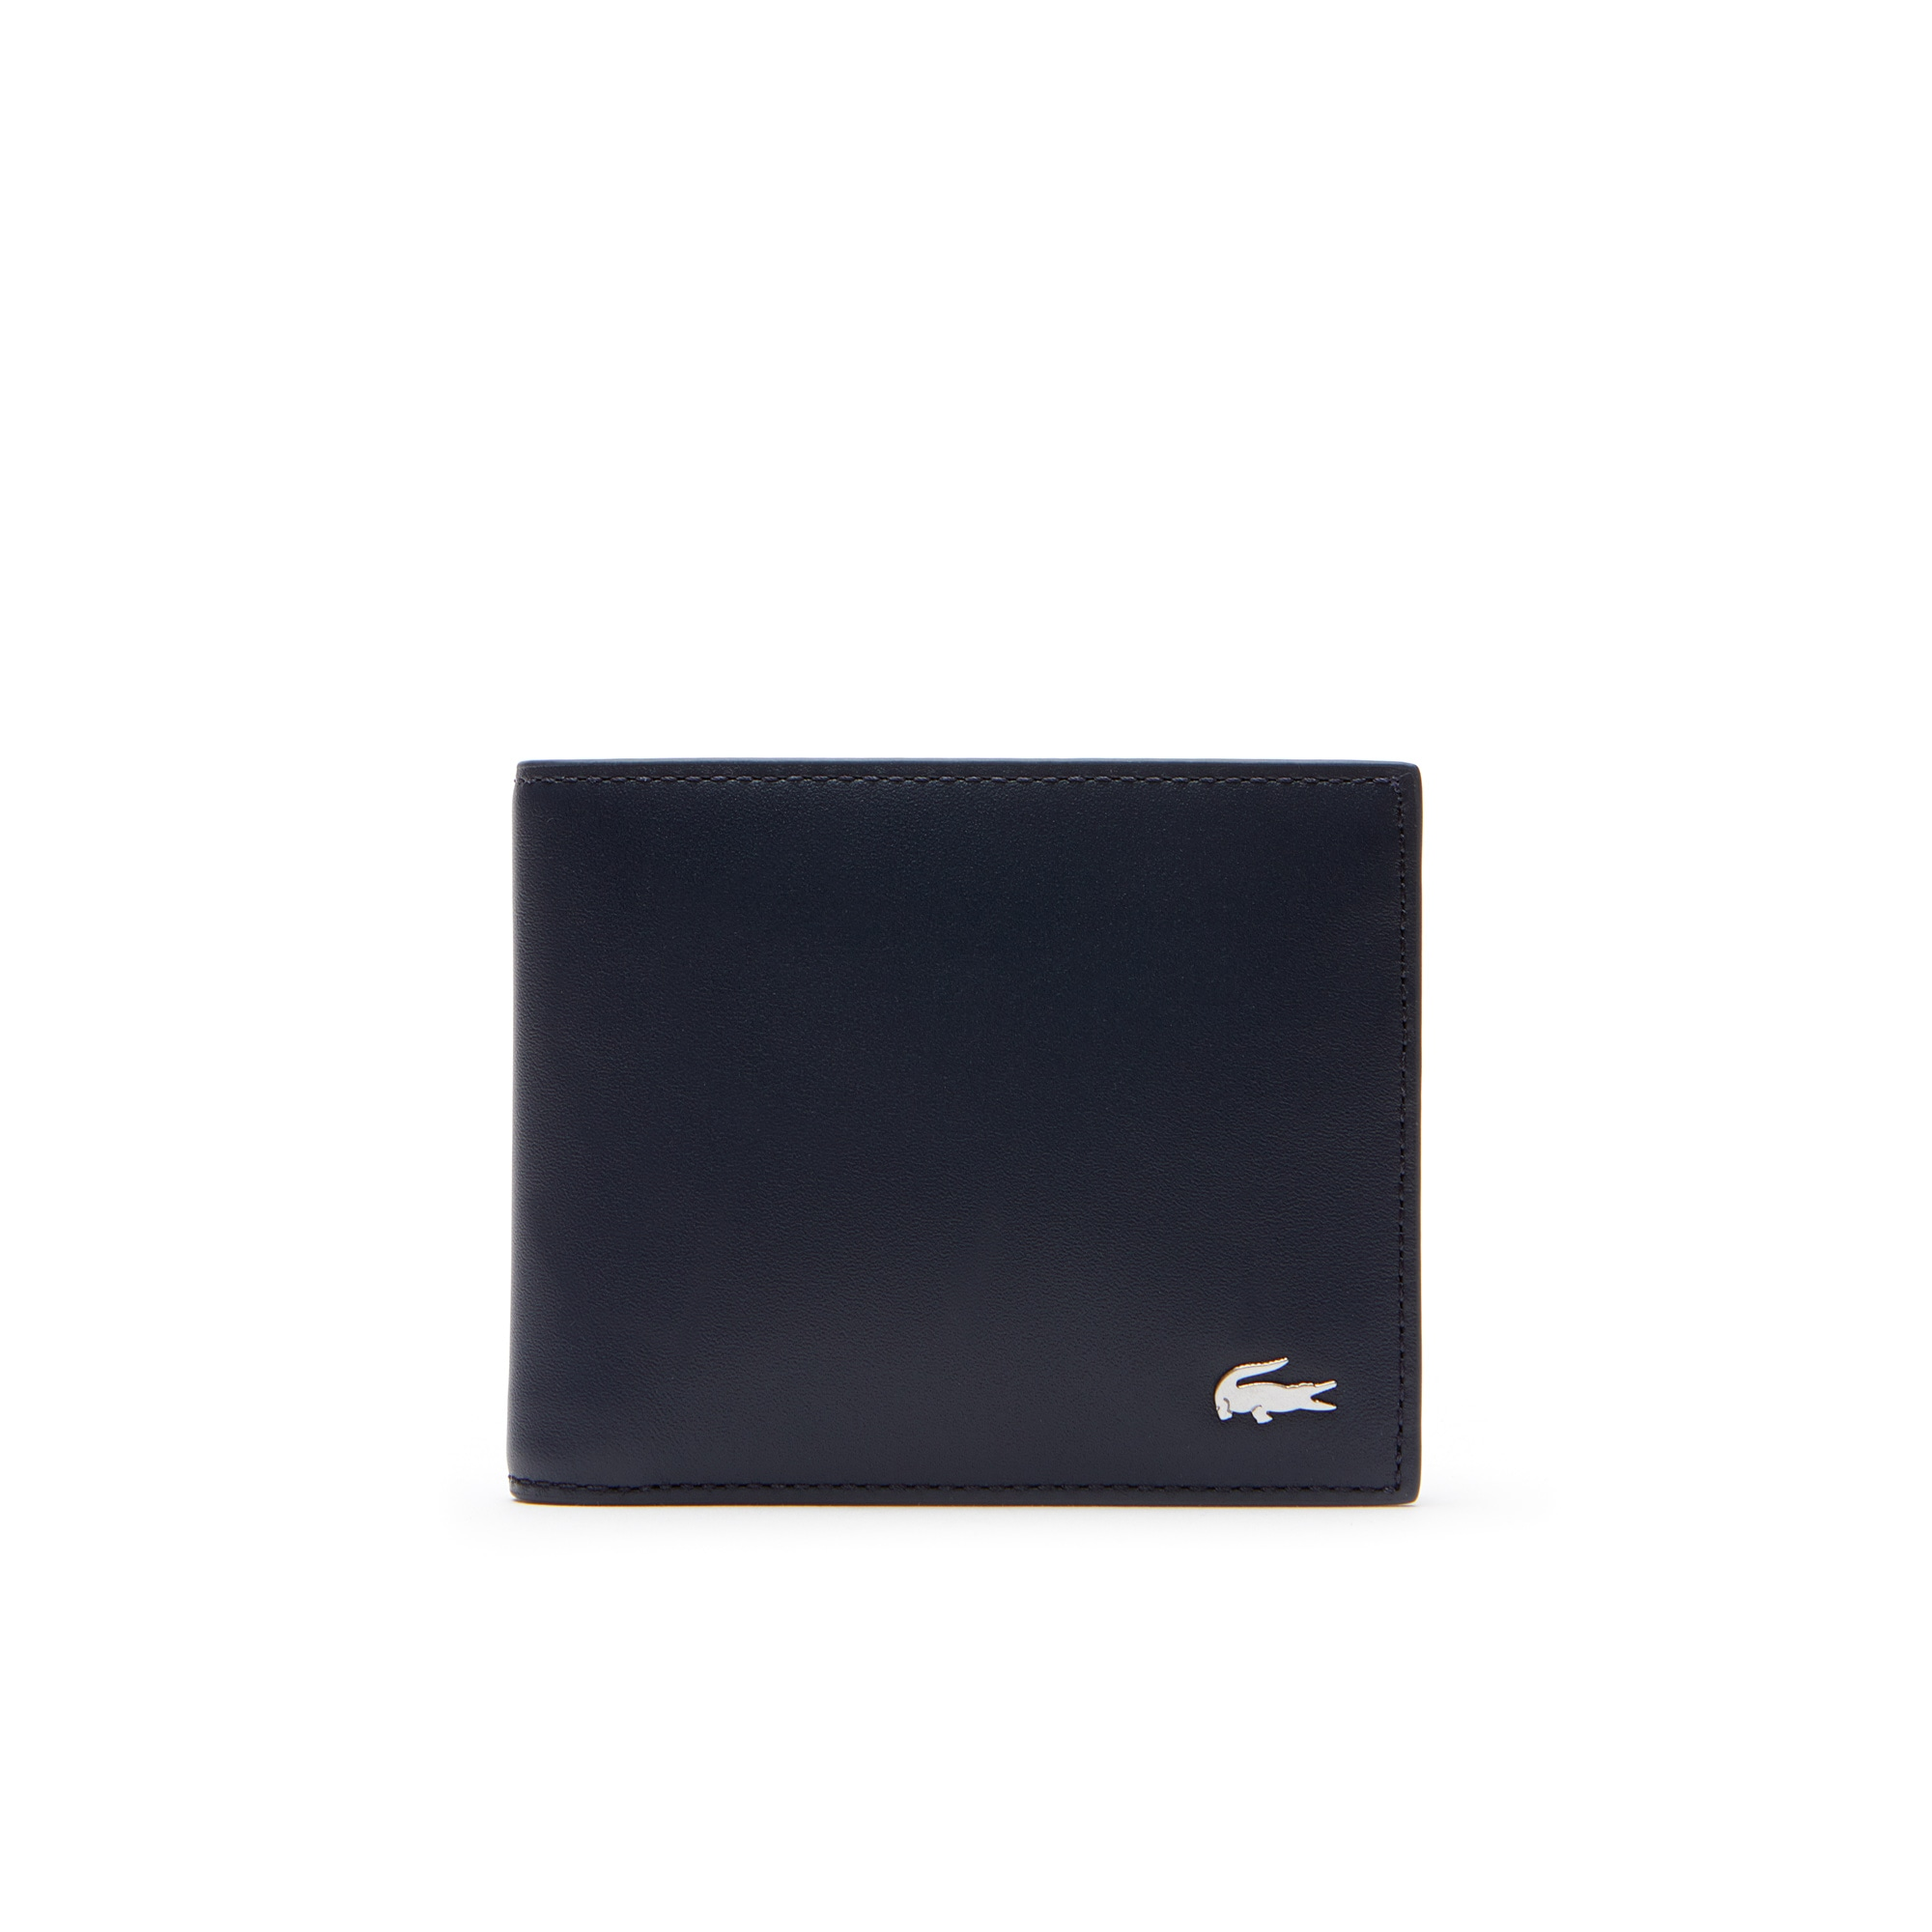 Portefeuille Fitzgerald en cuir color block 6 cartes